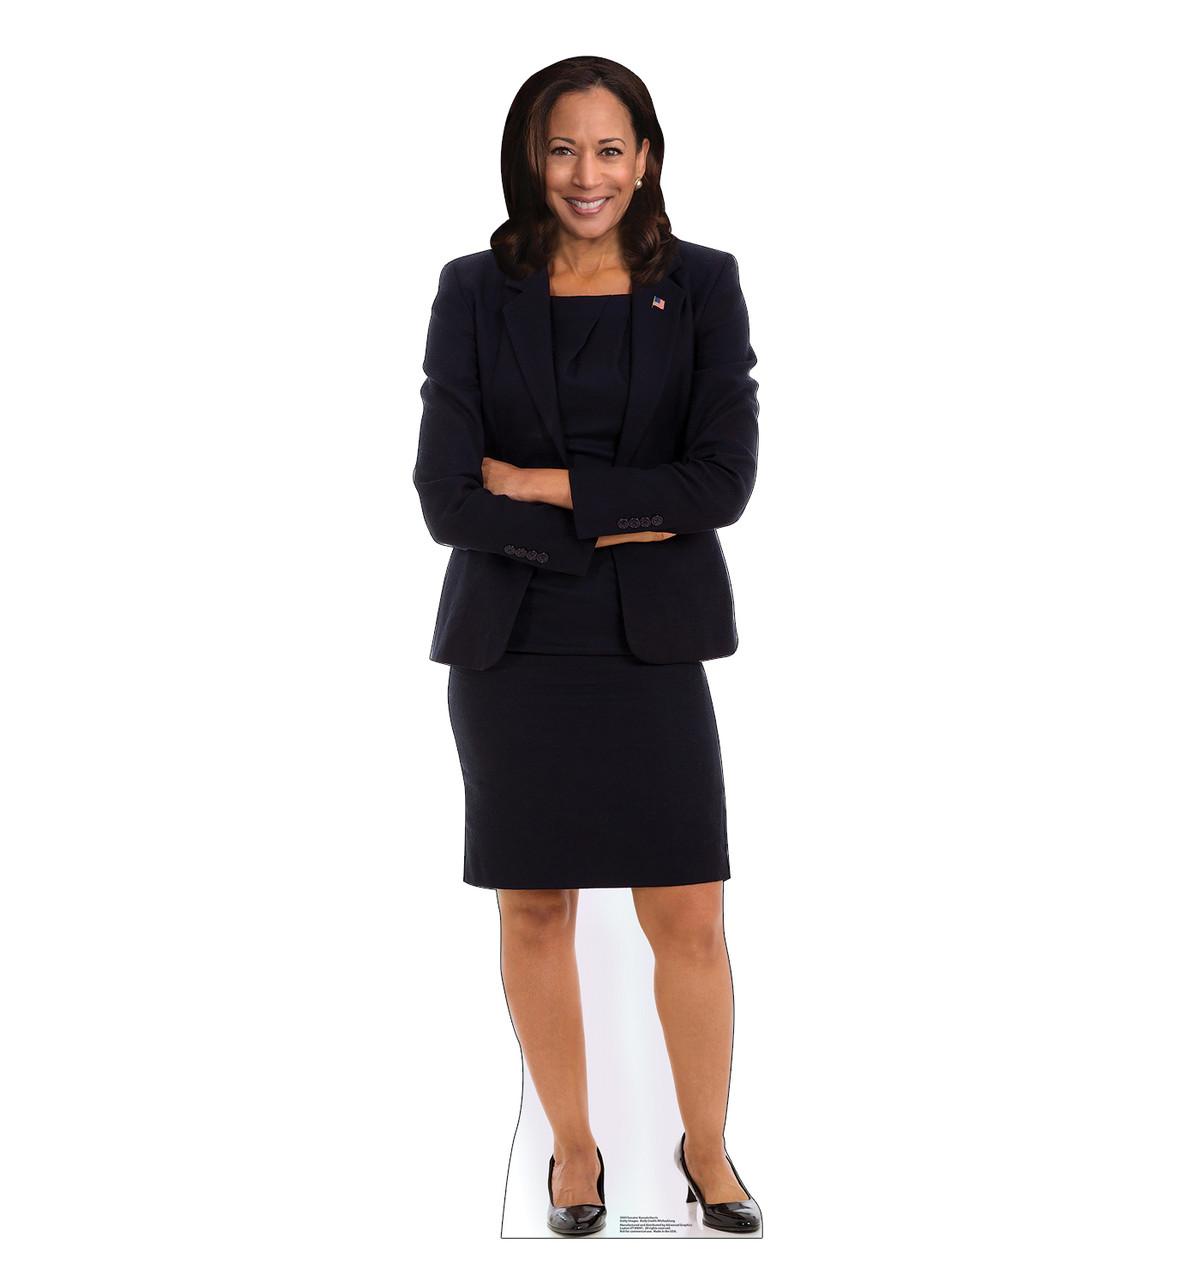 Vice President Kamala Harris Cardboard Cutout.